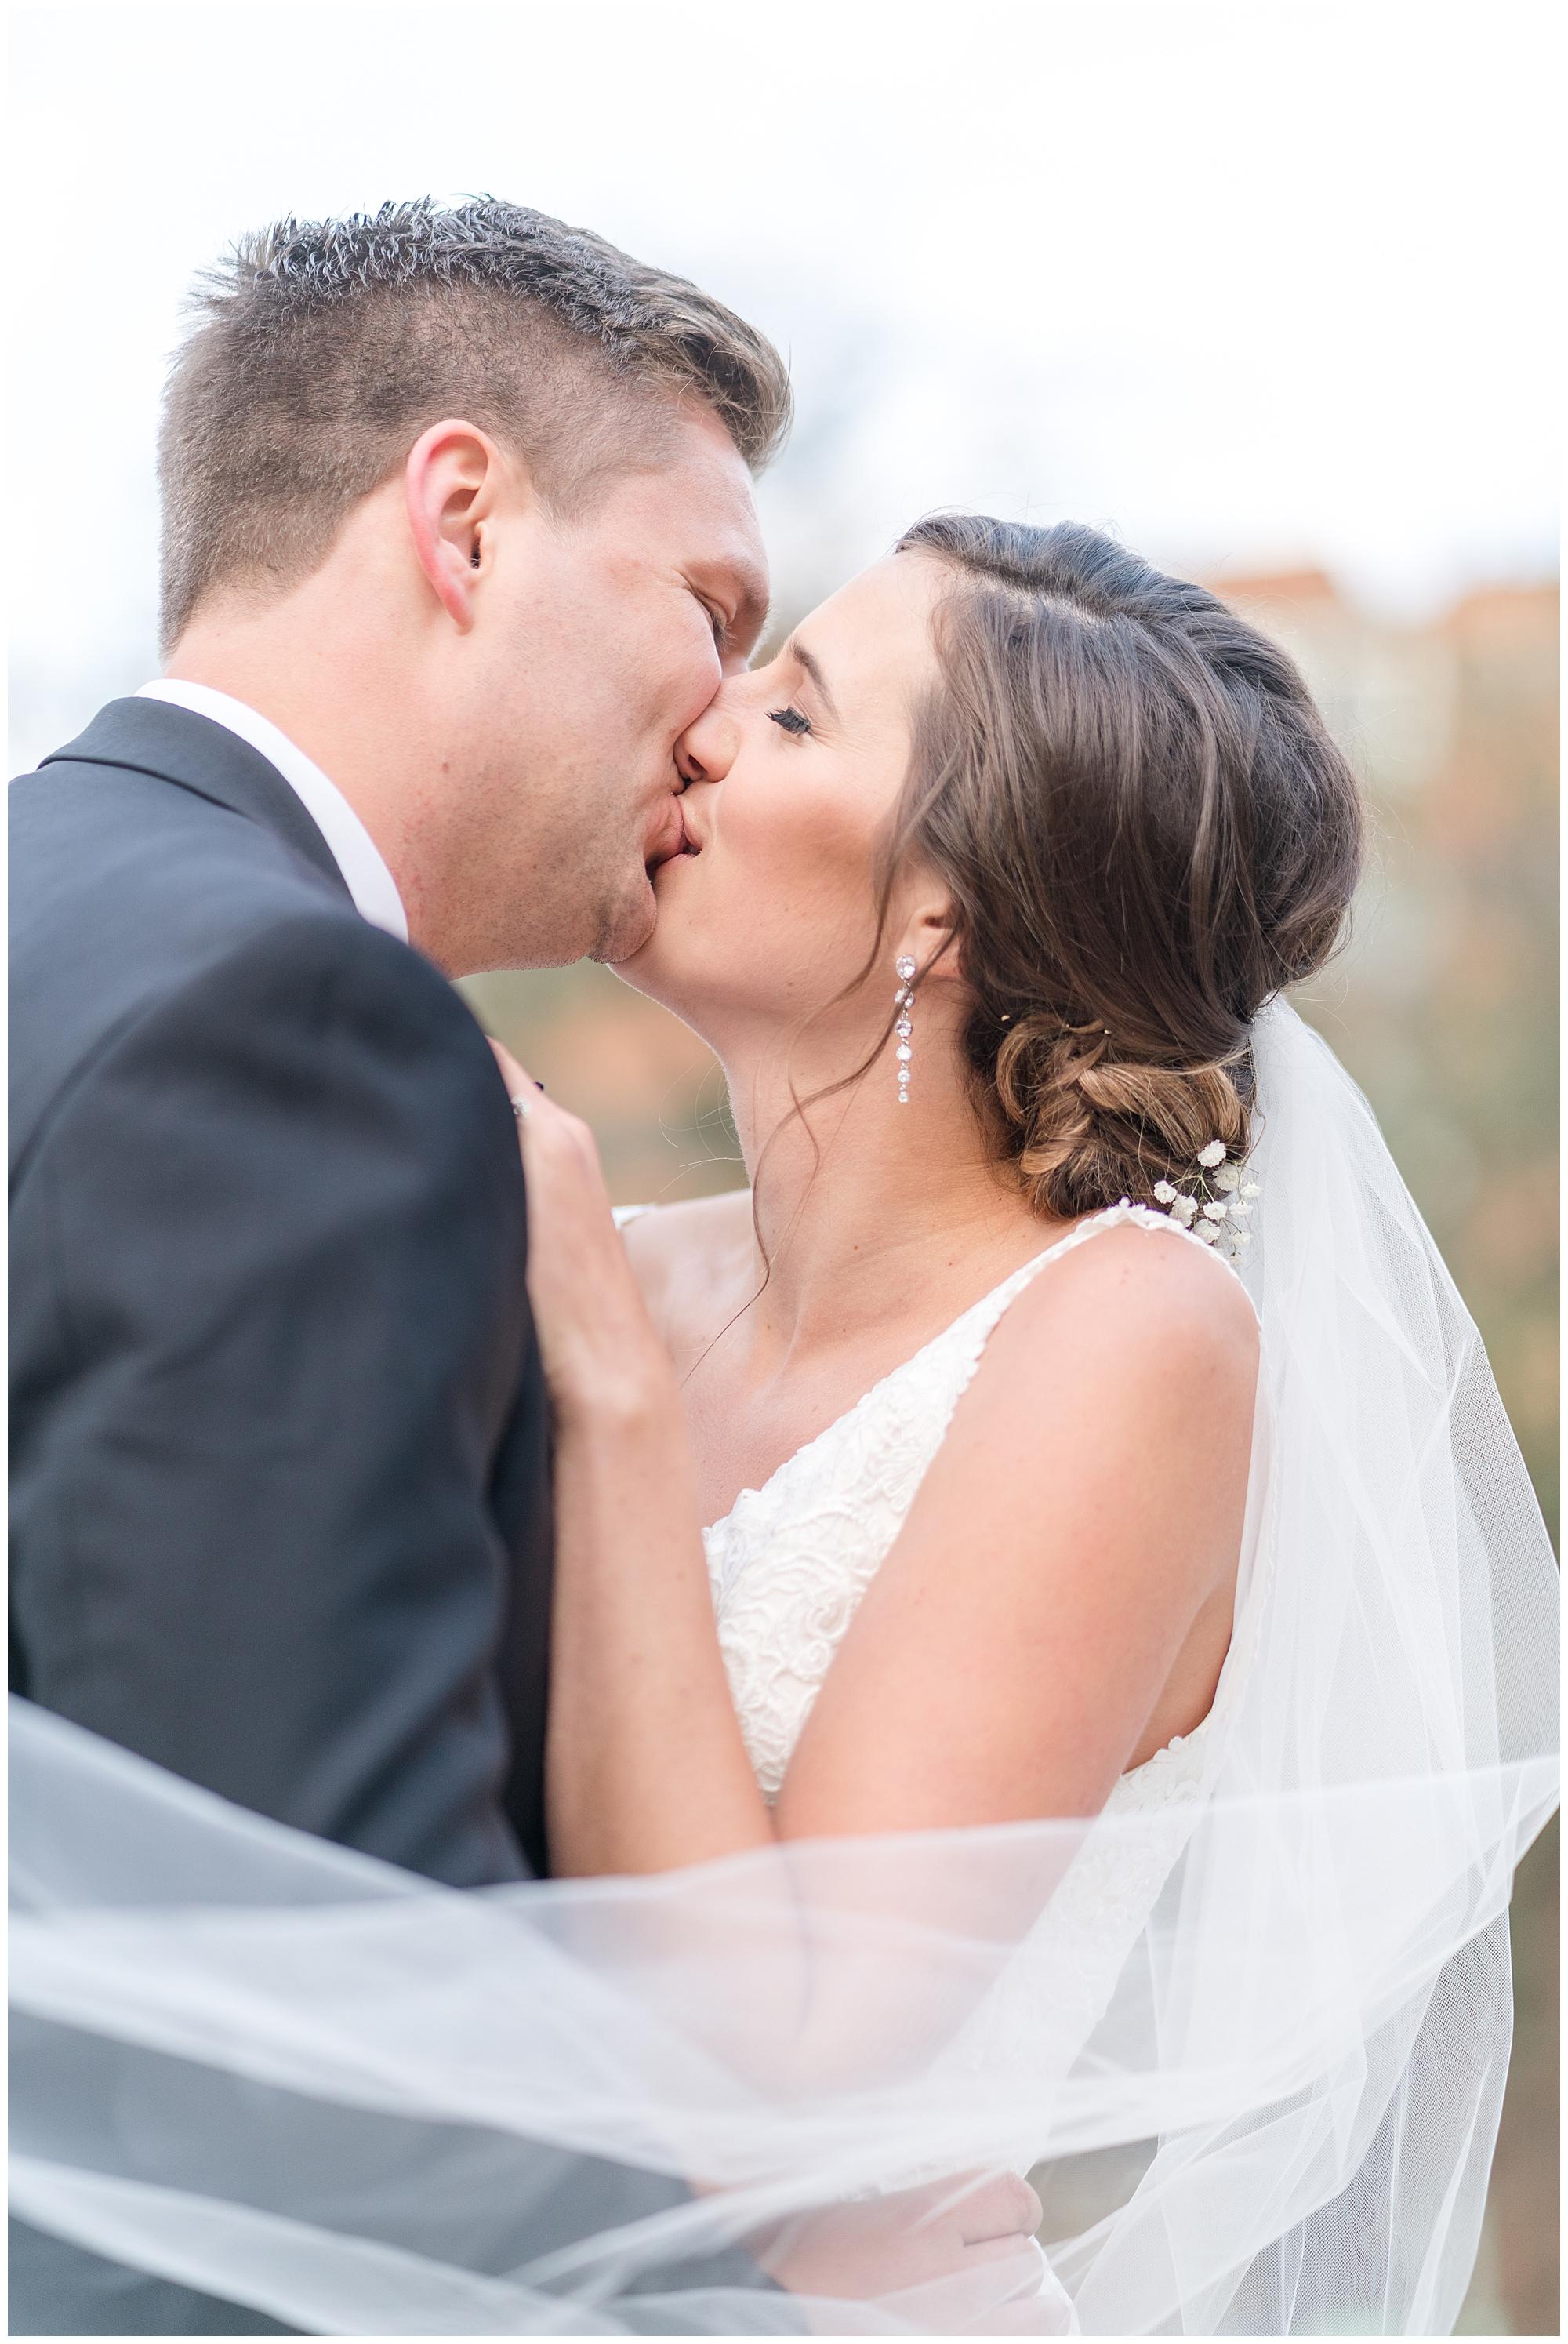 A bride and groom kiss at DuPont Circle during their Washington DC wedding.